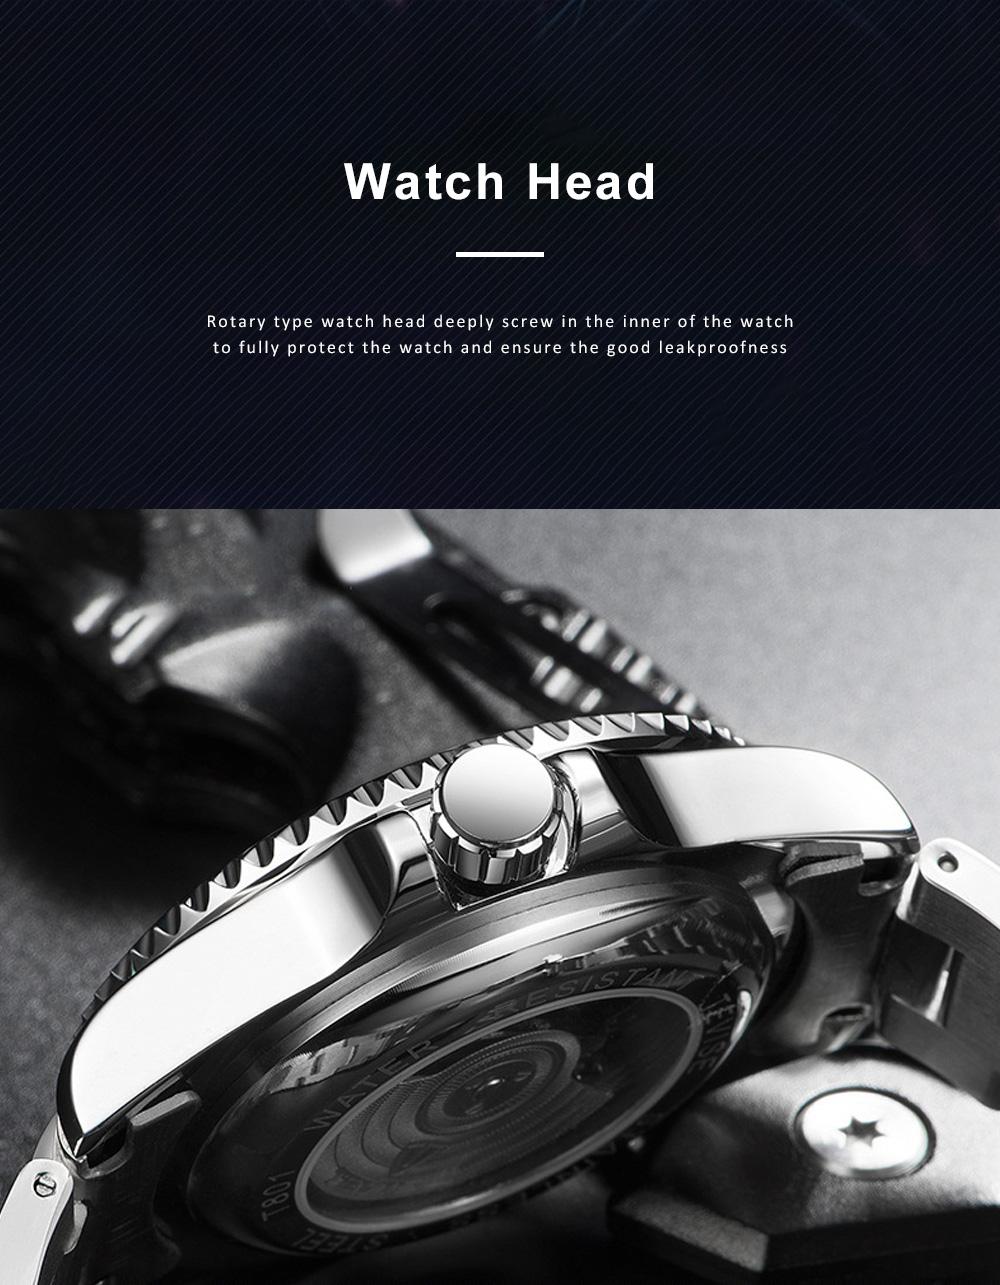 Night Luminous Mechanical Men's Watch Multifunctional Waterproof Wrist Watch for Businessman 3